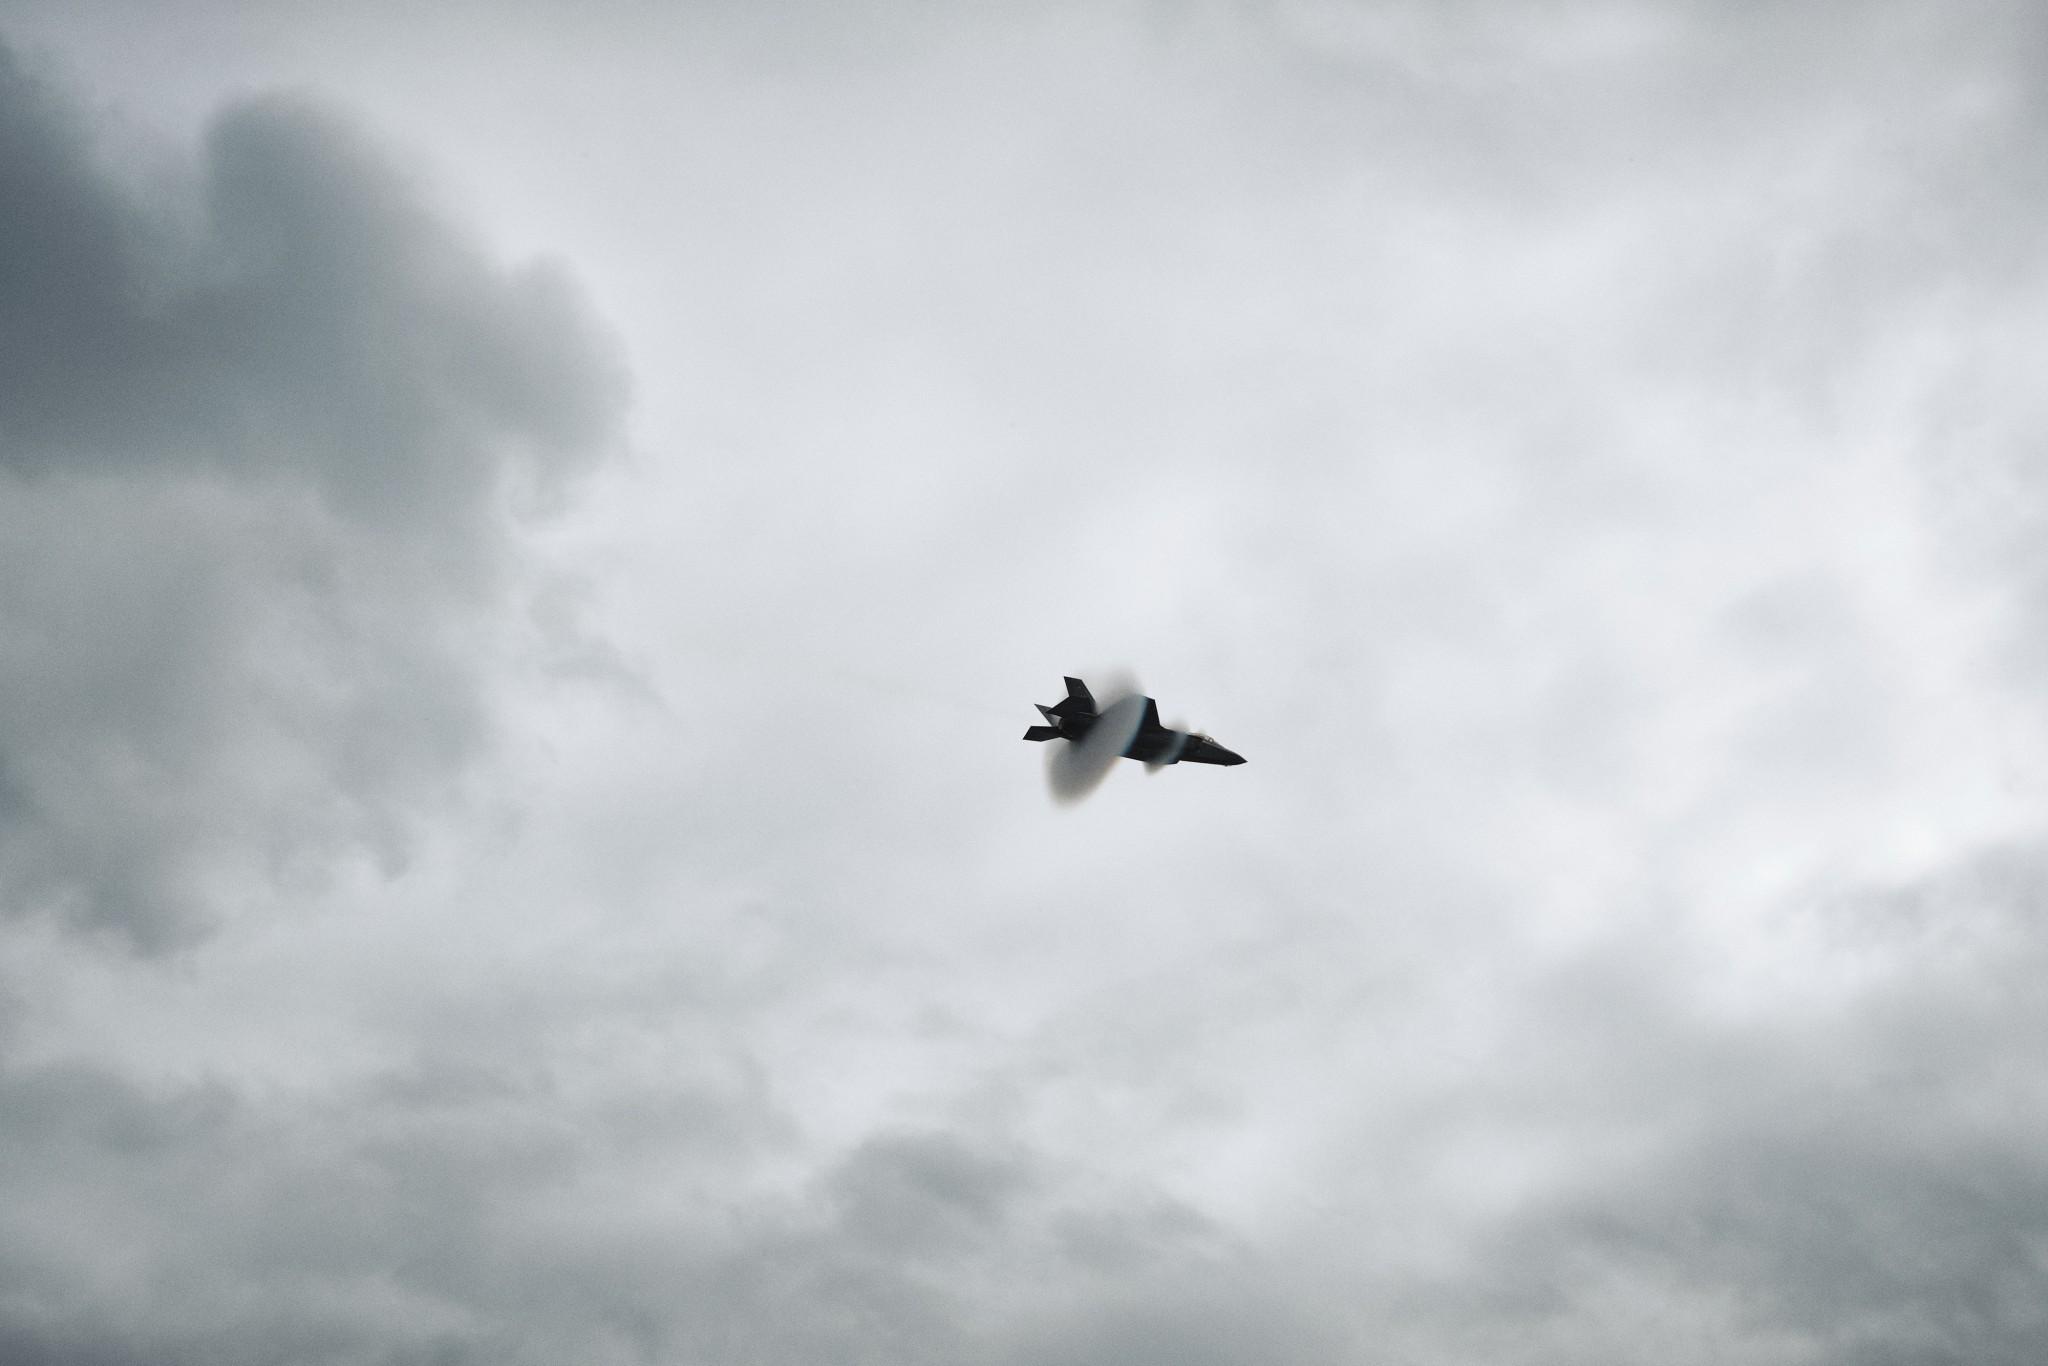 12---USAF-F-35A-Lightning-II---Capt.-Andrew-Dojo-Olson.jpg